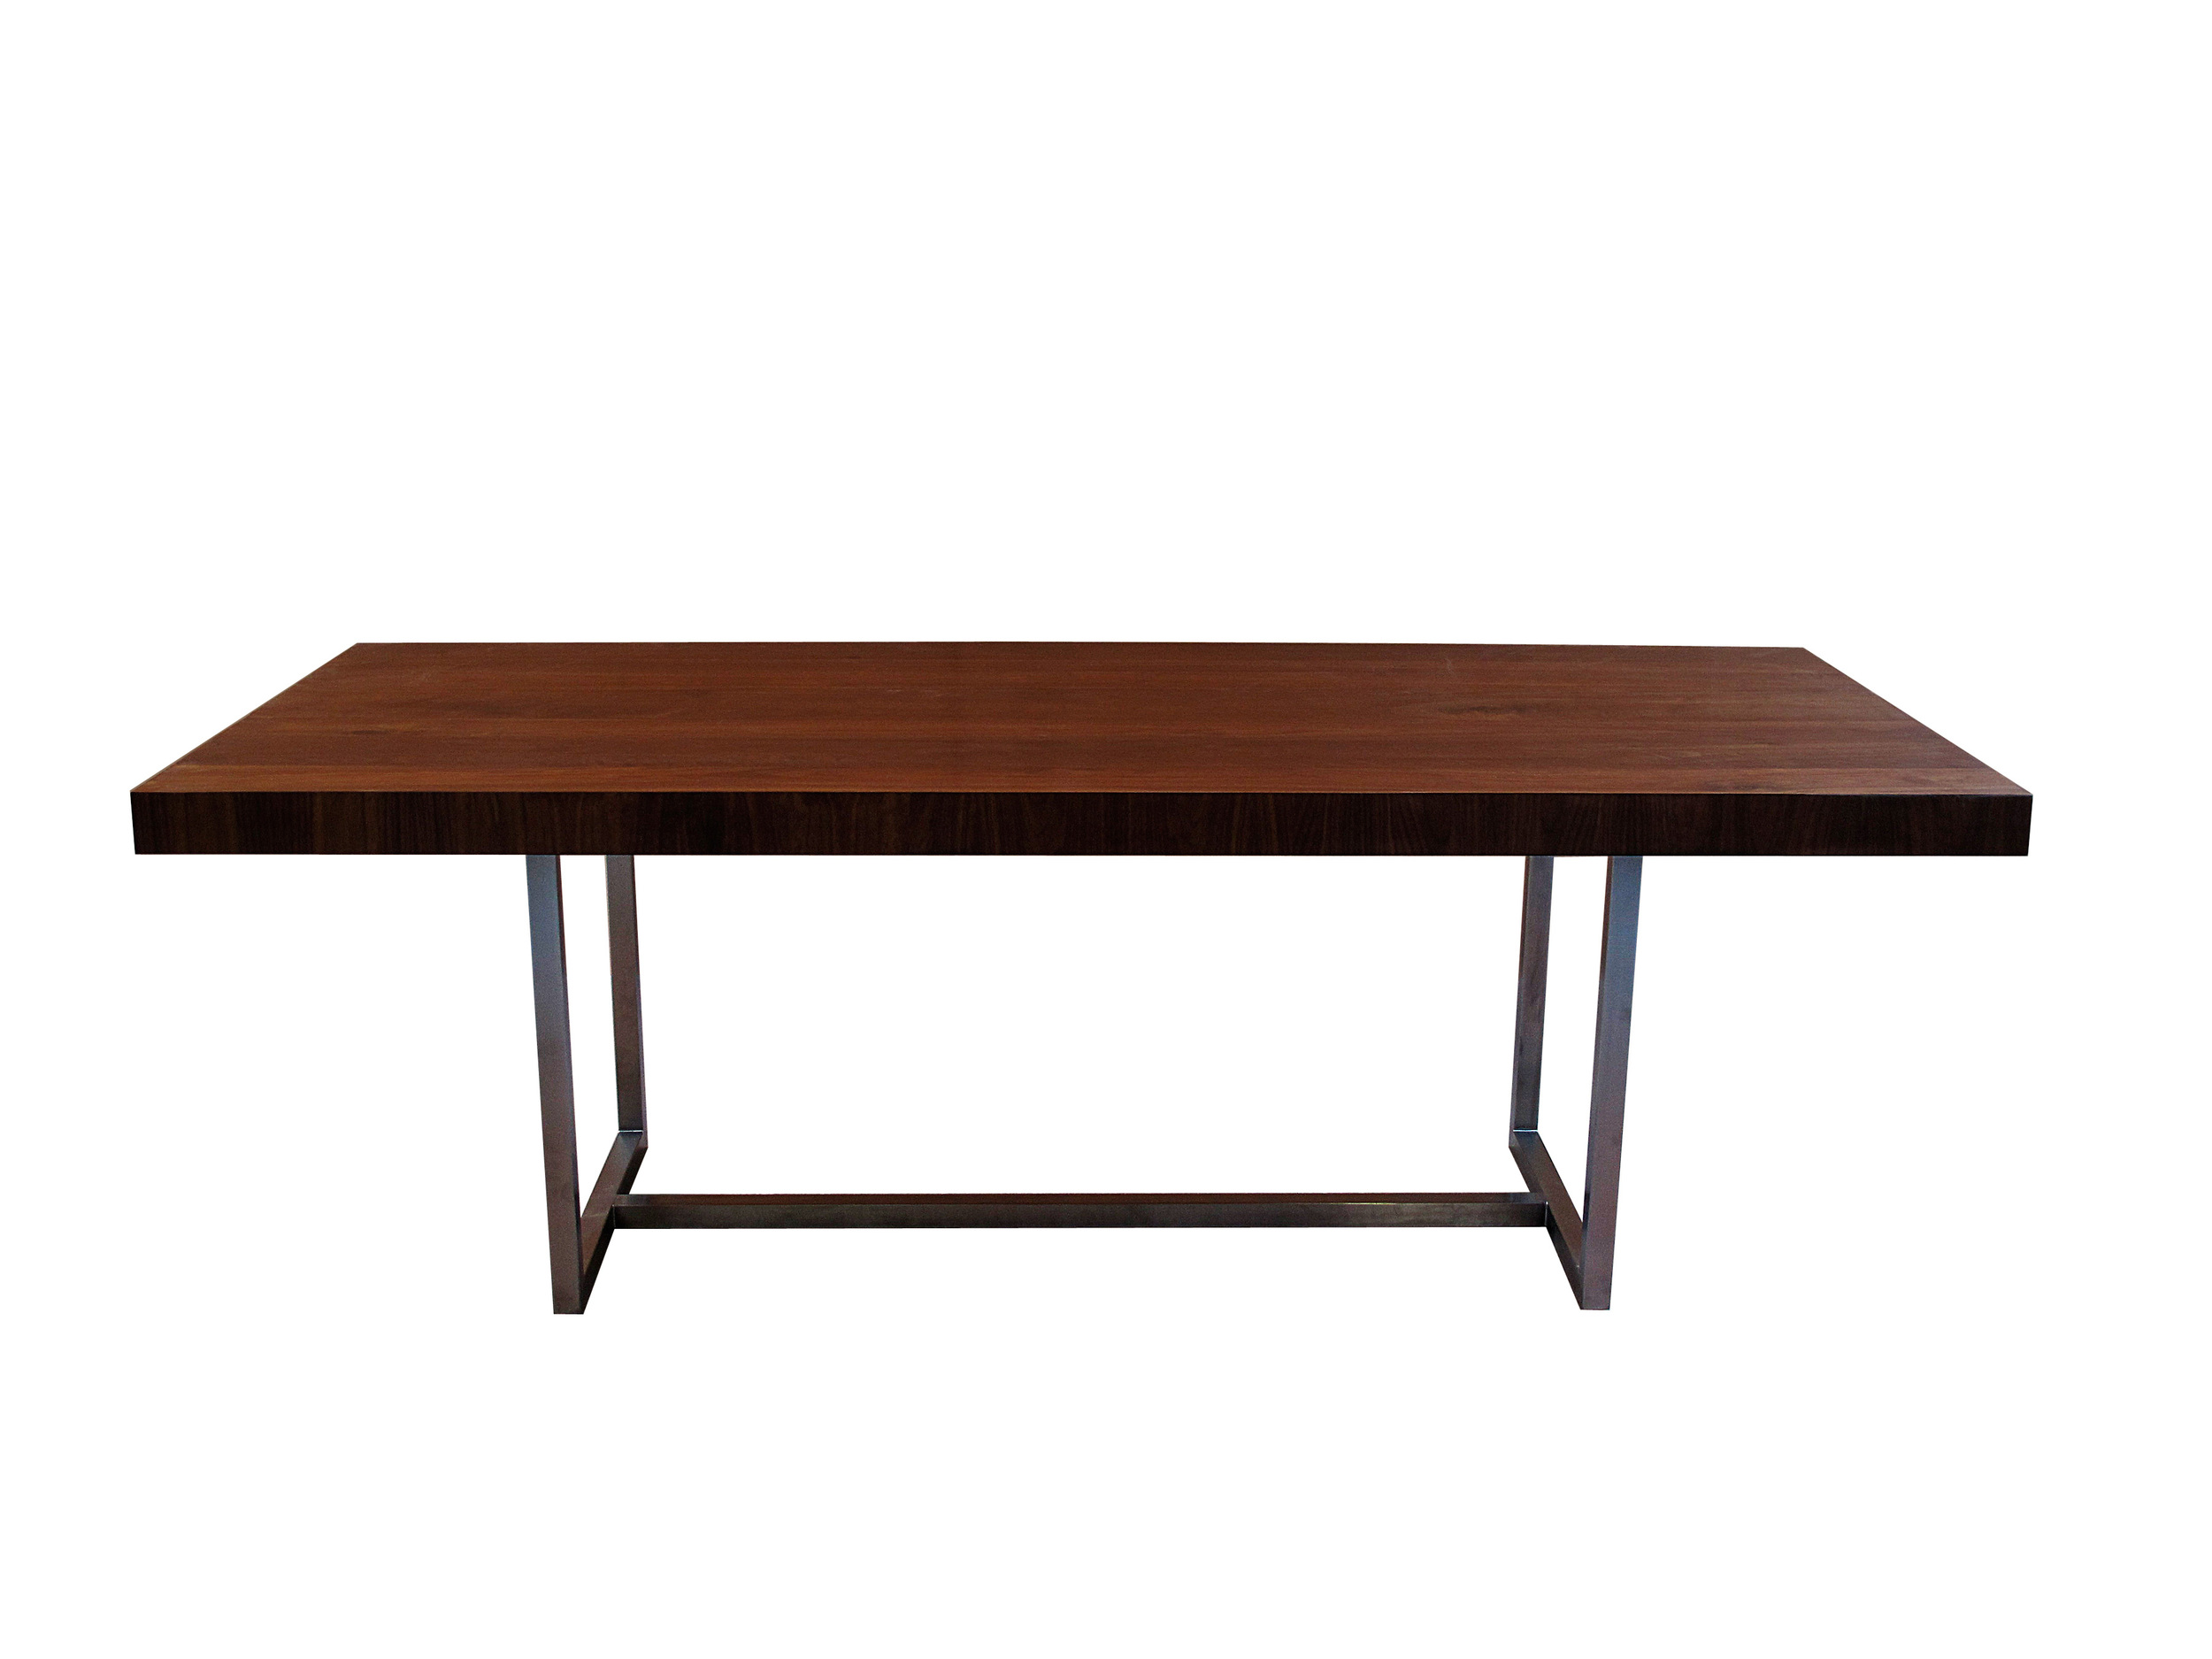 CROSBY Table